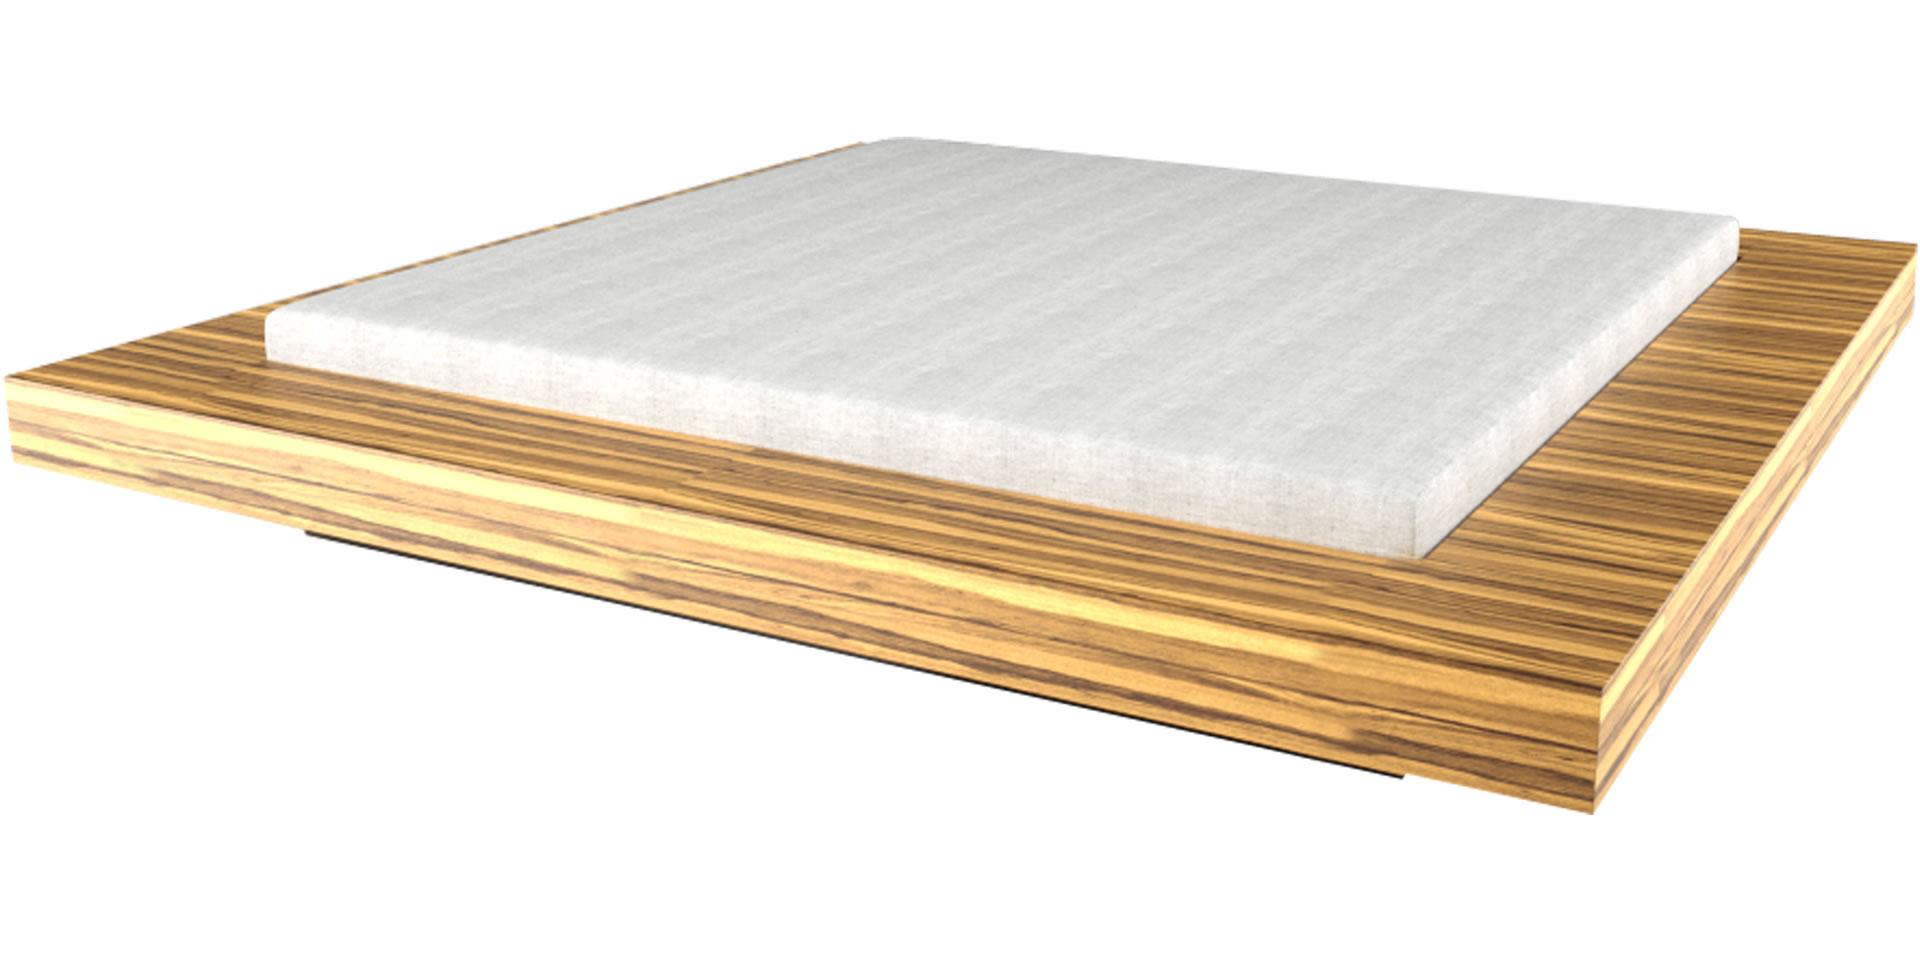 Full Size of Bett Flach 120 X 200 Nolte Betten 160x200 Komplett 120x190 Luxus Schramm 100x200 Rückwand Test Mit Bettkasten Paletten 140x200 Aufbewahrung Weißes 120x200 Bett Bett Flach